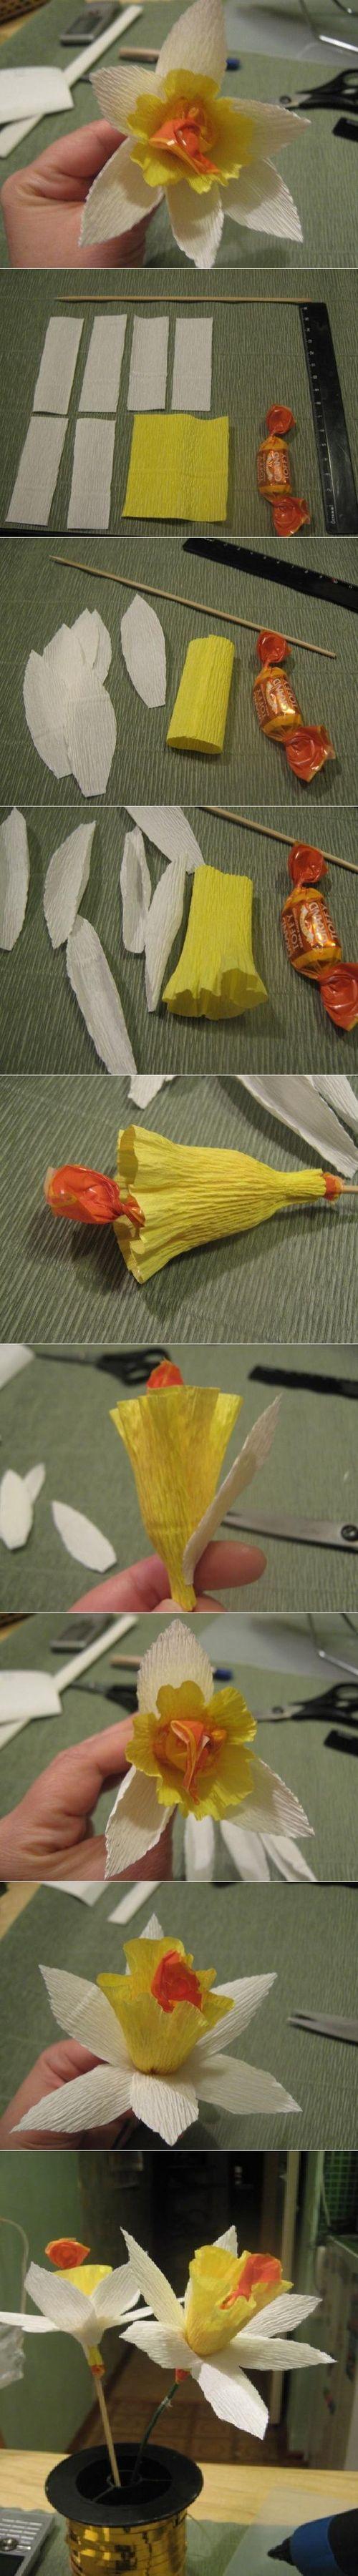 DIY Narcissus Flower Chocolate DIY Projects / UsefulDIY.com